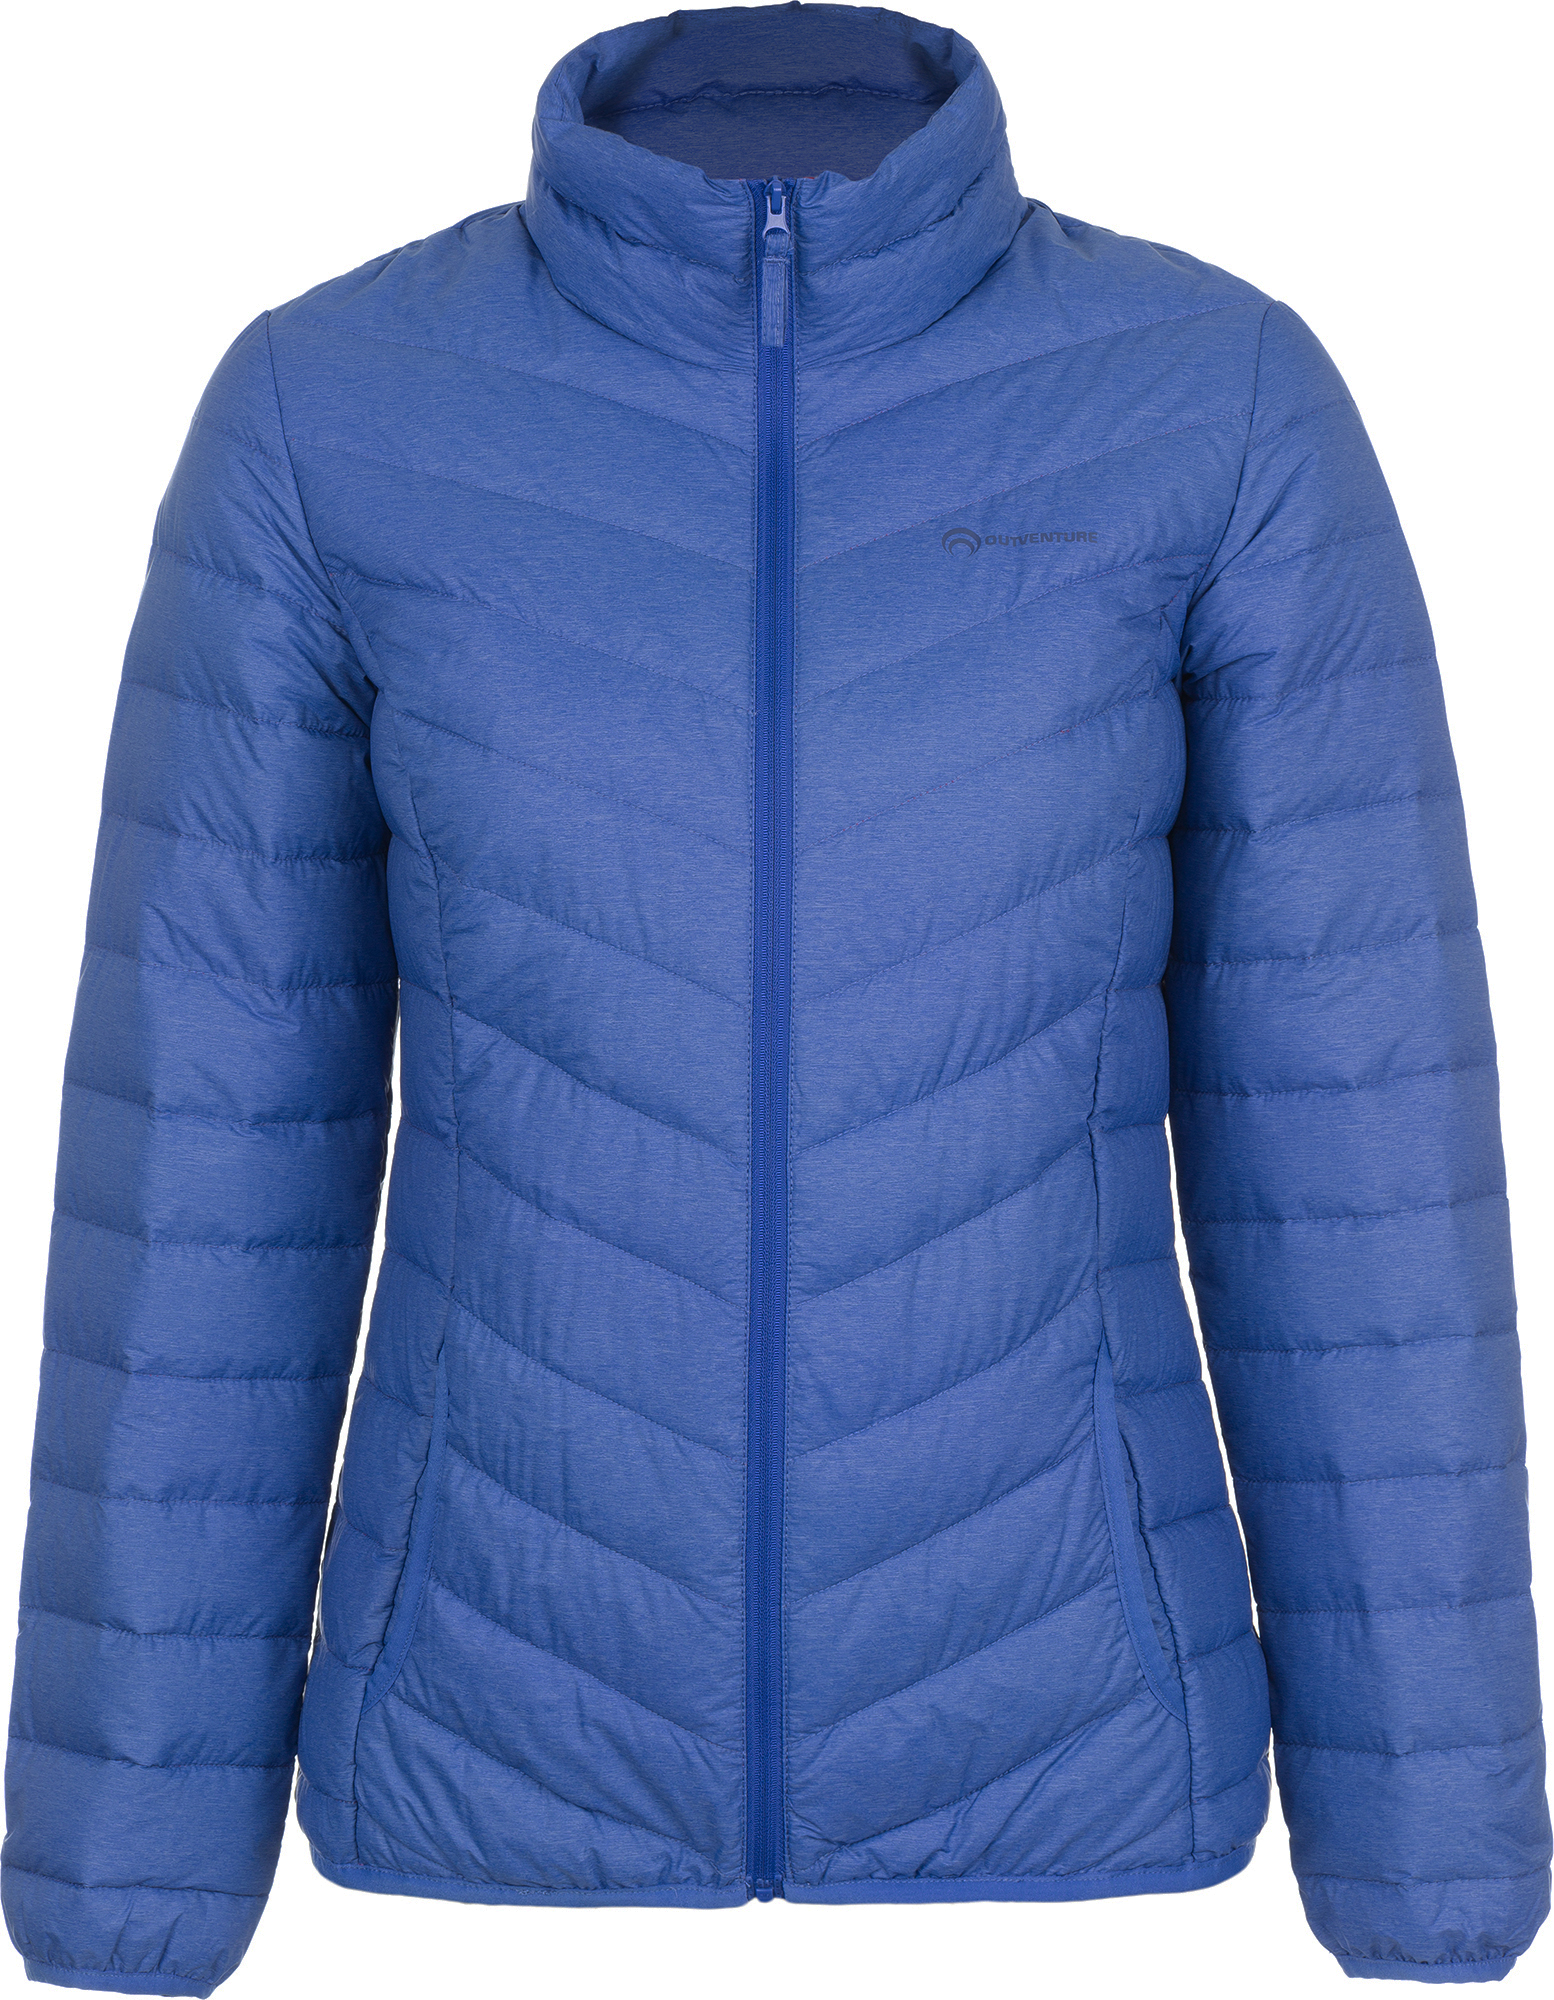 Outventure Куртка пуховая женская Outventure, размер 50